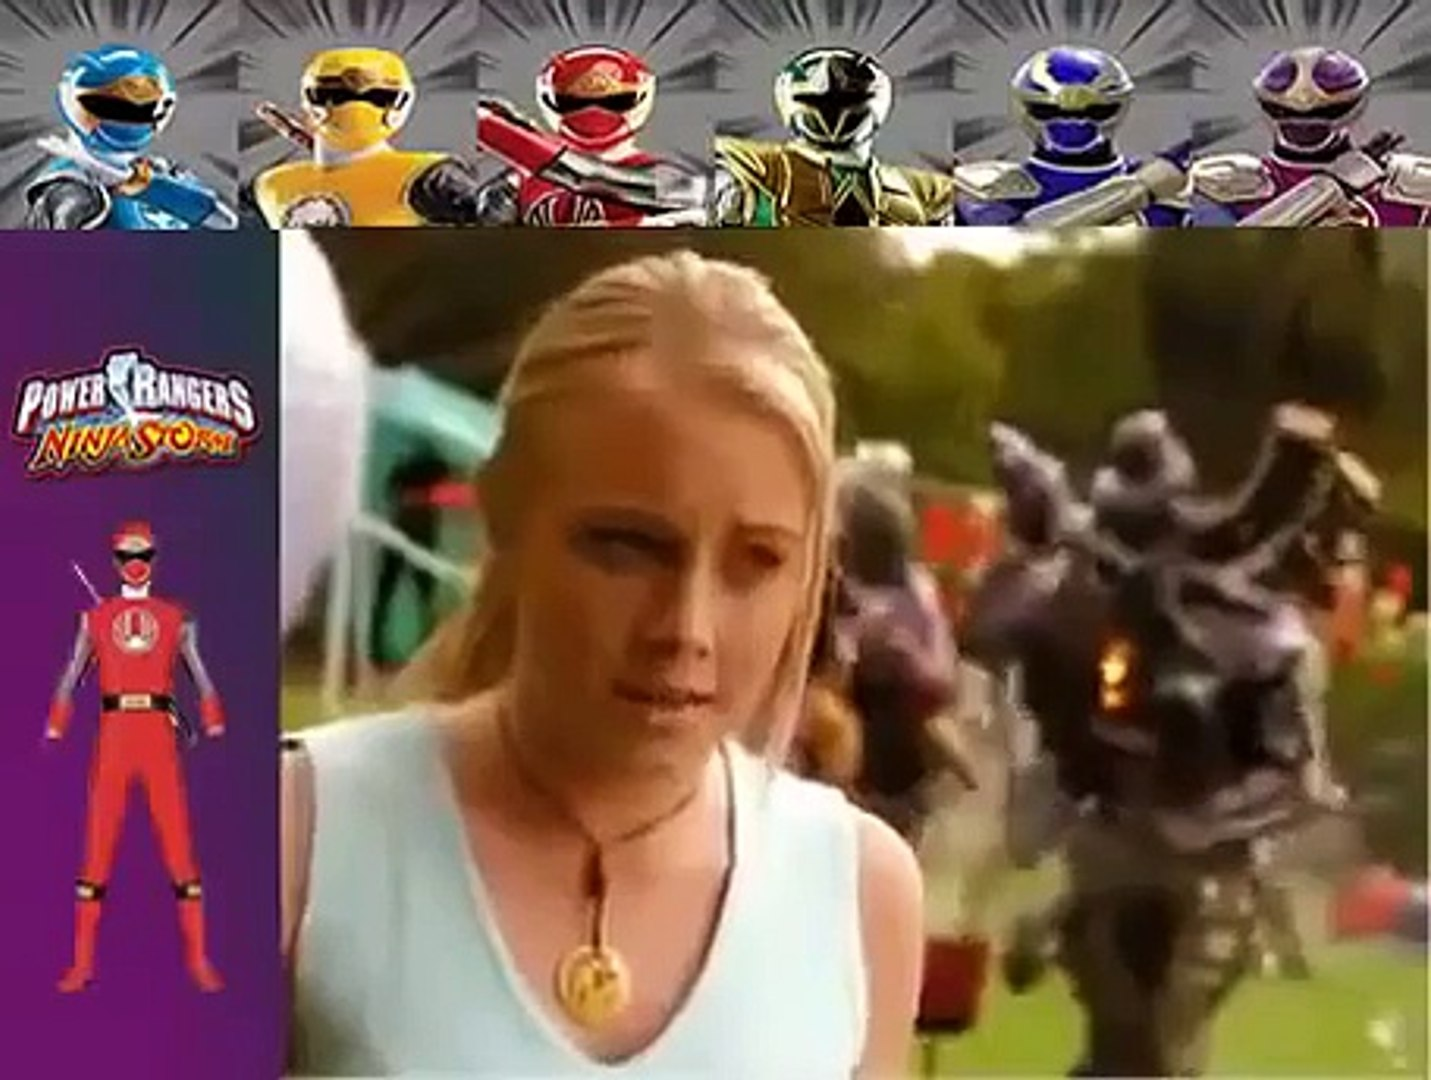 Power Rangers Tormenta Ninja Capitulo 30